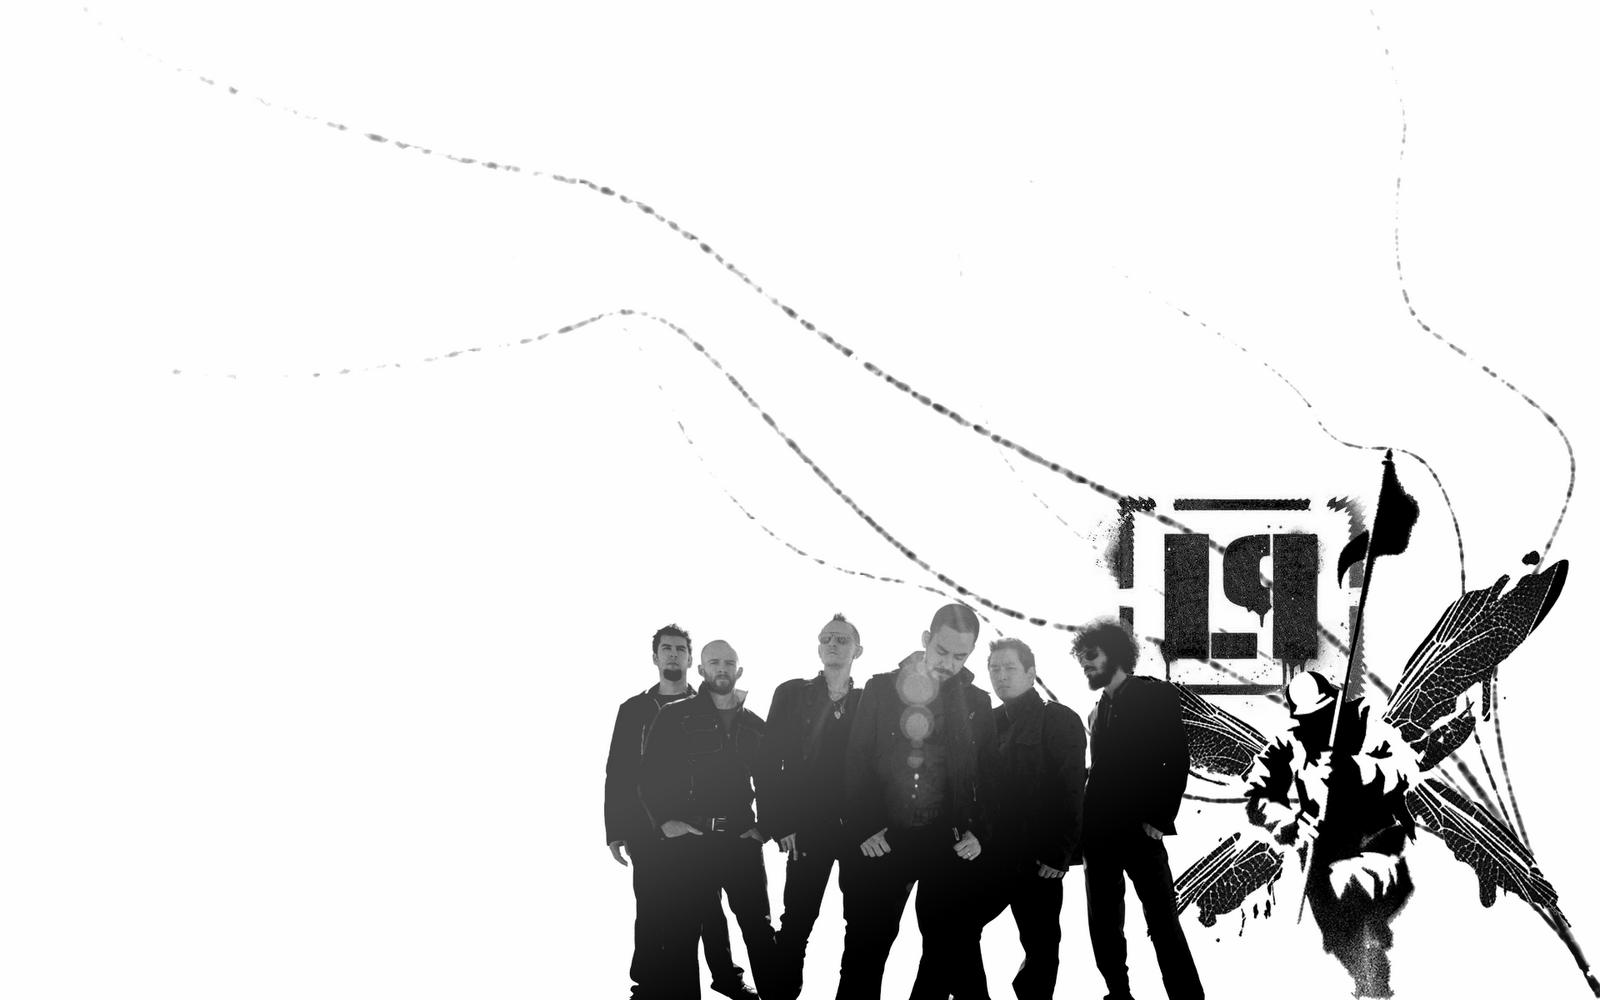 Fall Live Wallpaper Iphone Wallpapers Hd Linkin Park Banda De Rock 32 Hd